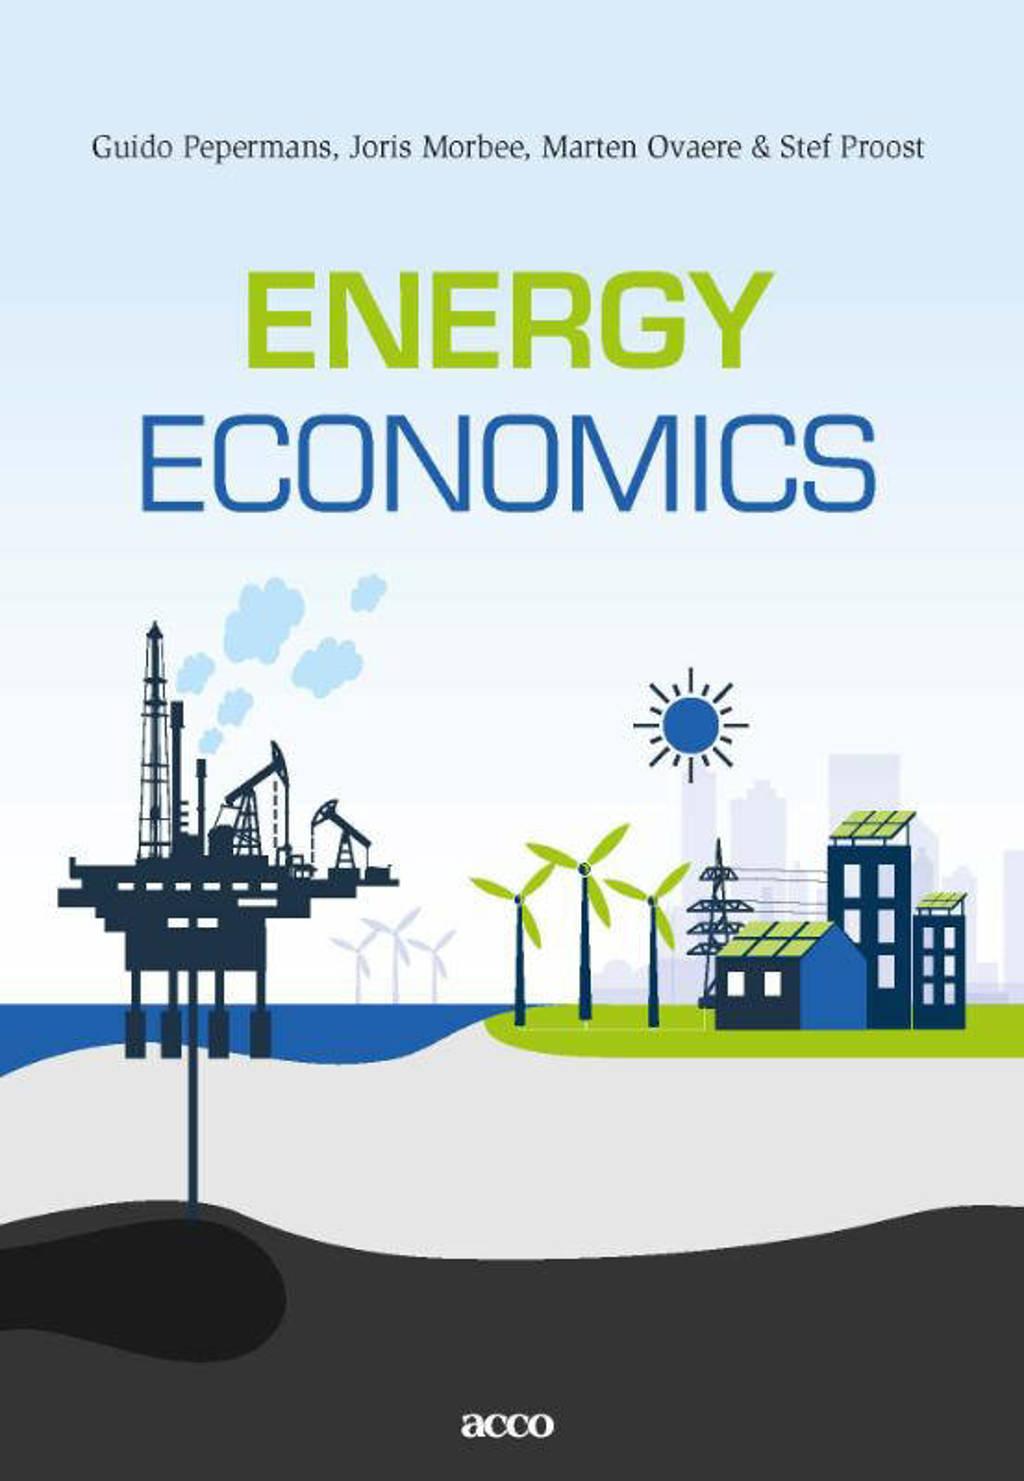 Energy Economics - Guido Pepermans, Joris Morbee, Marten Ovaere, e.a.